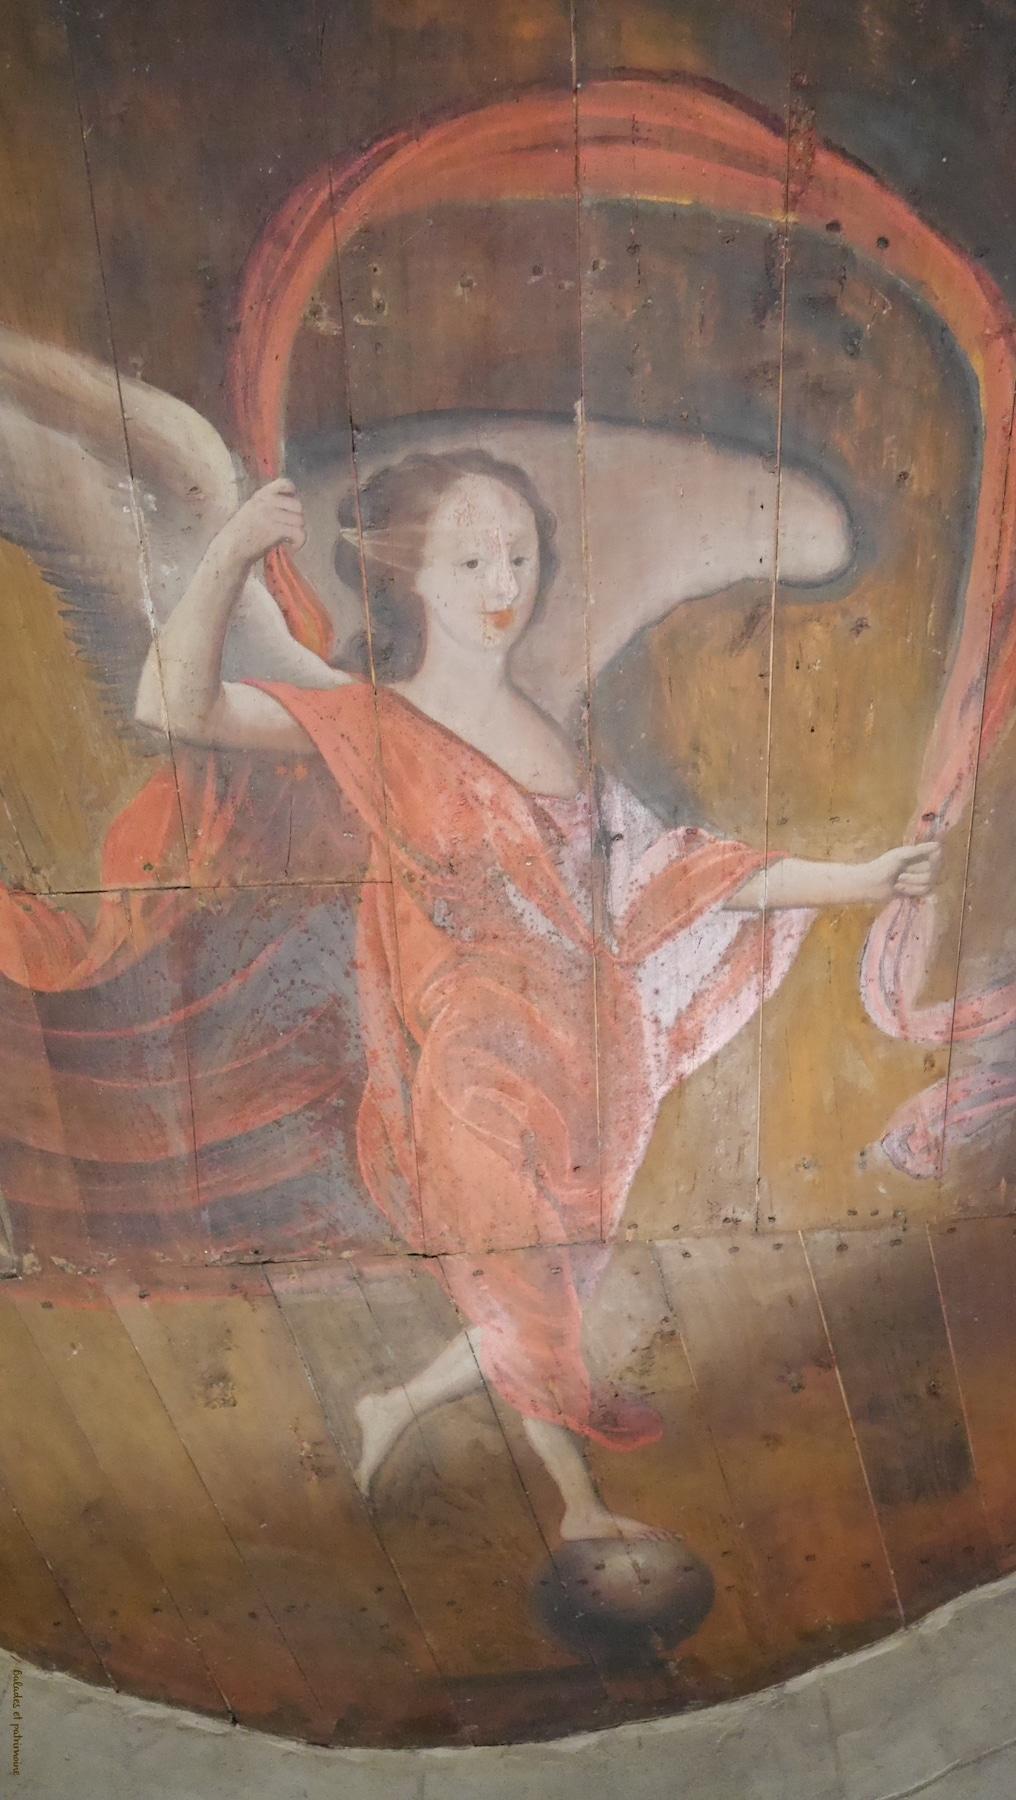 Larroque toirac-fresques